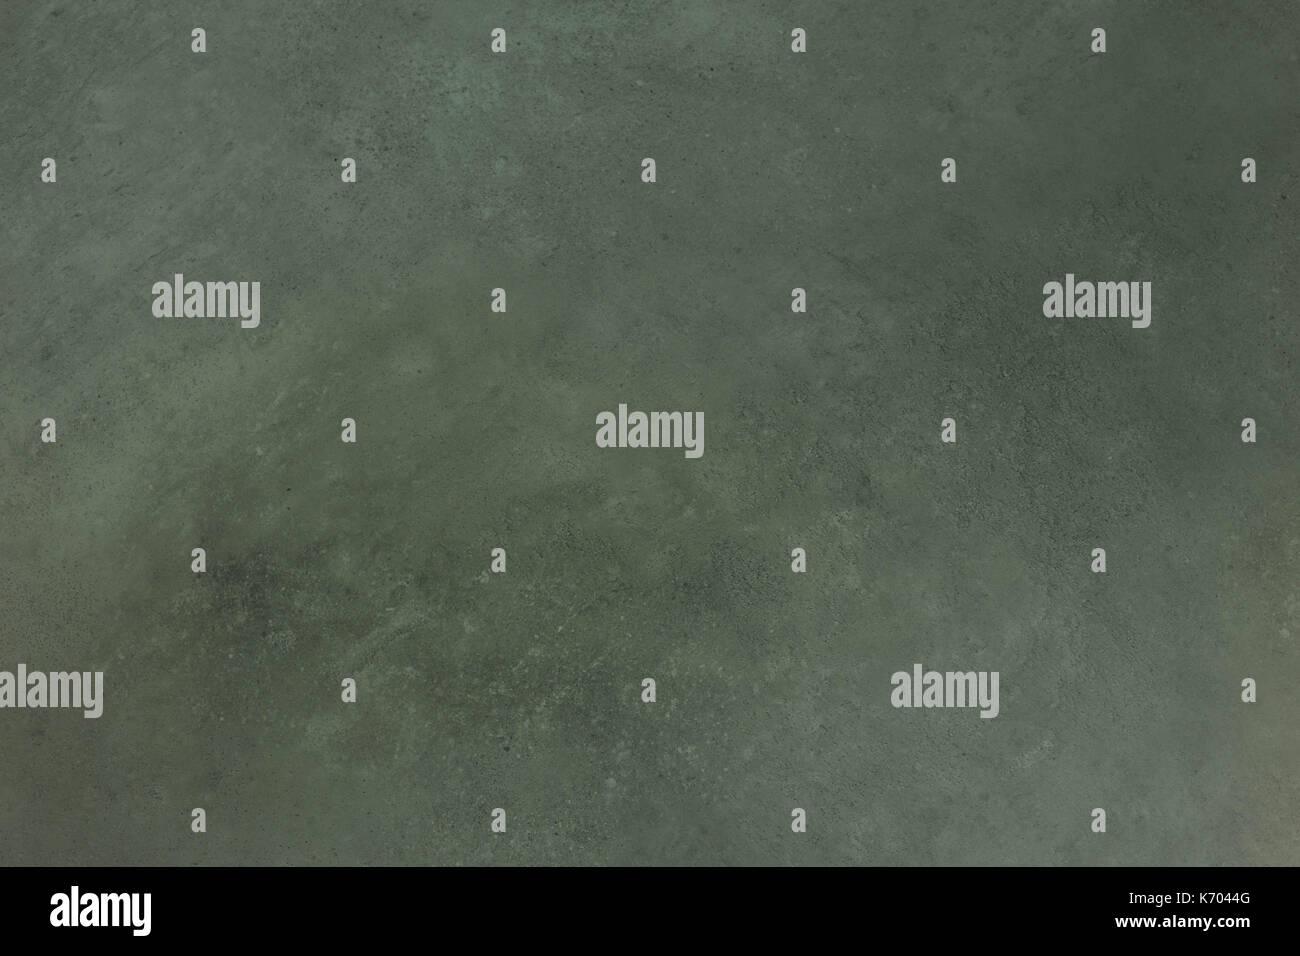 Decorative tiles / texture - Stock Image